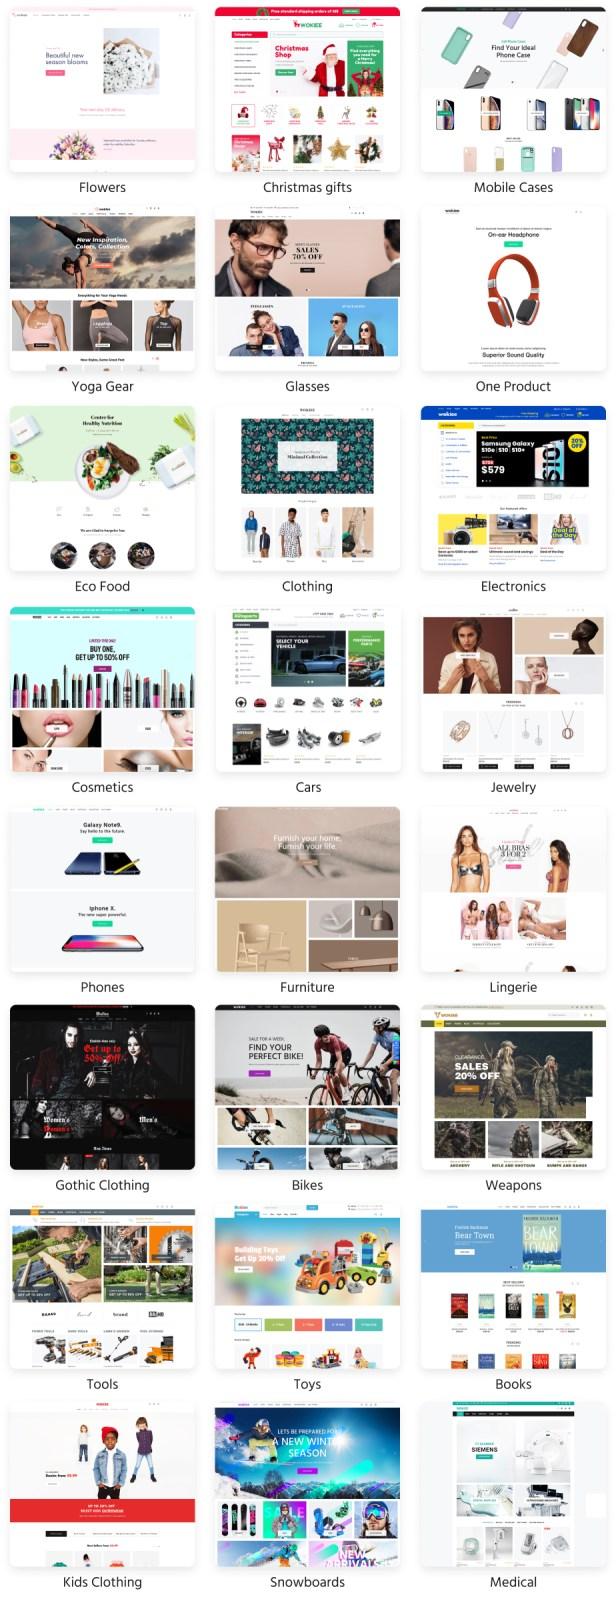 Wokiee - Multipurpose Shopify Theme - 21